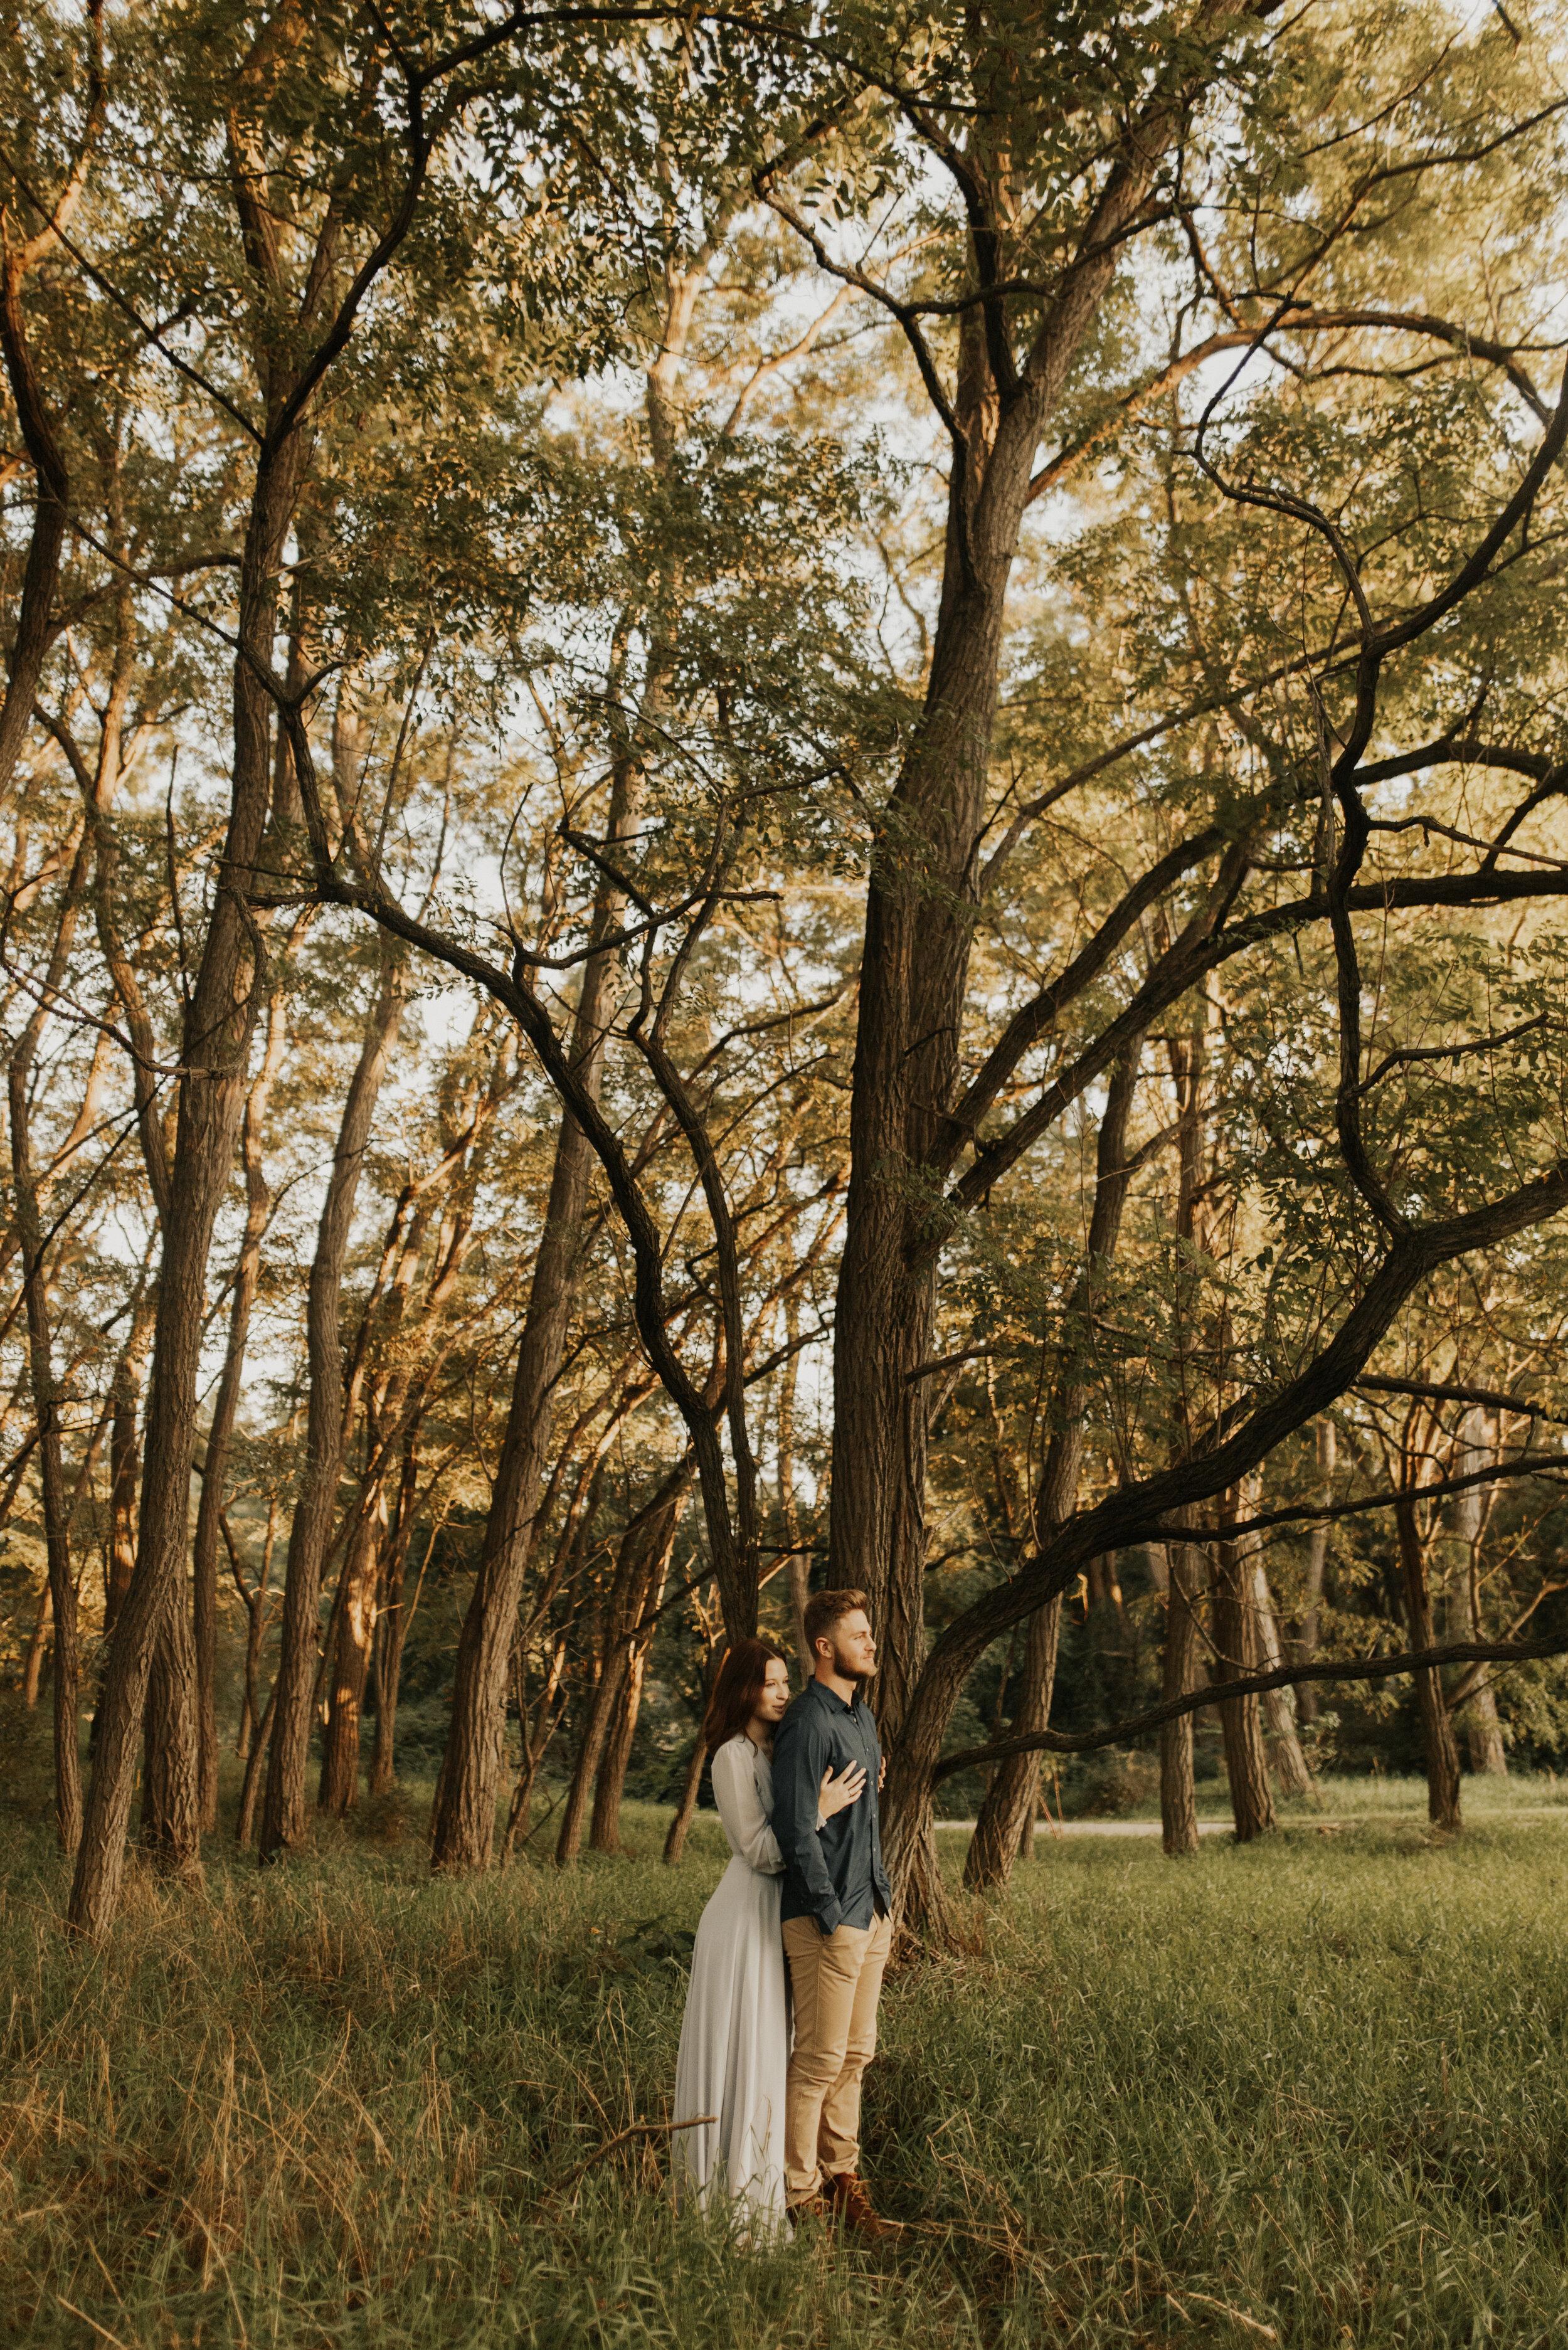 Meghan+Jake_Engagement55.jpg